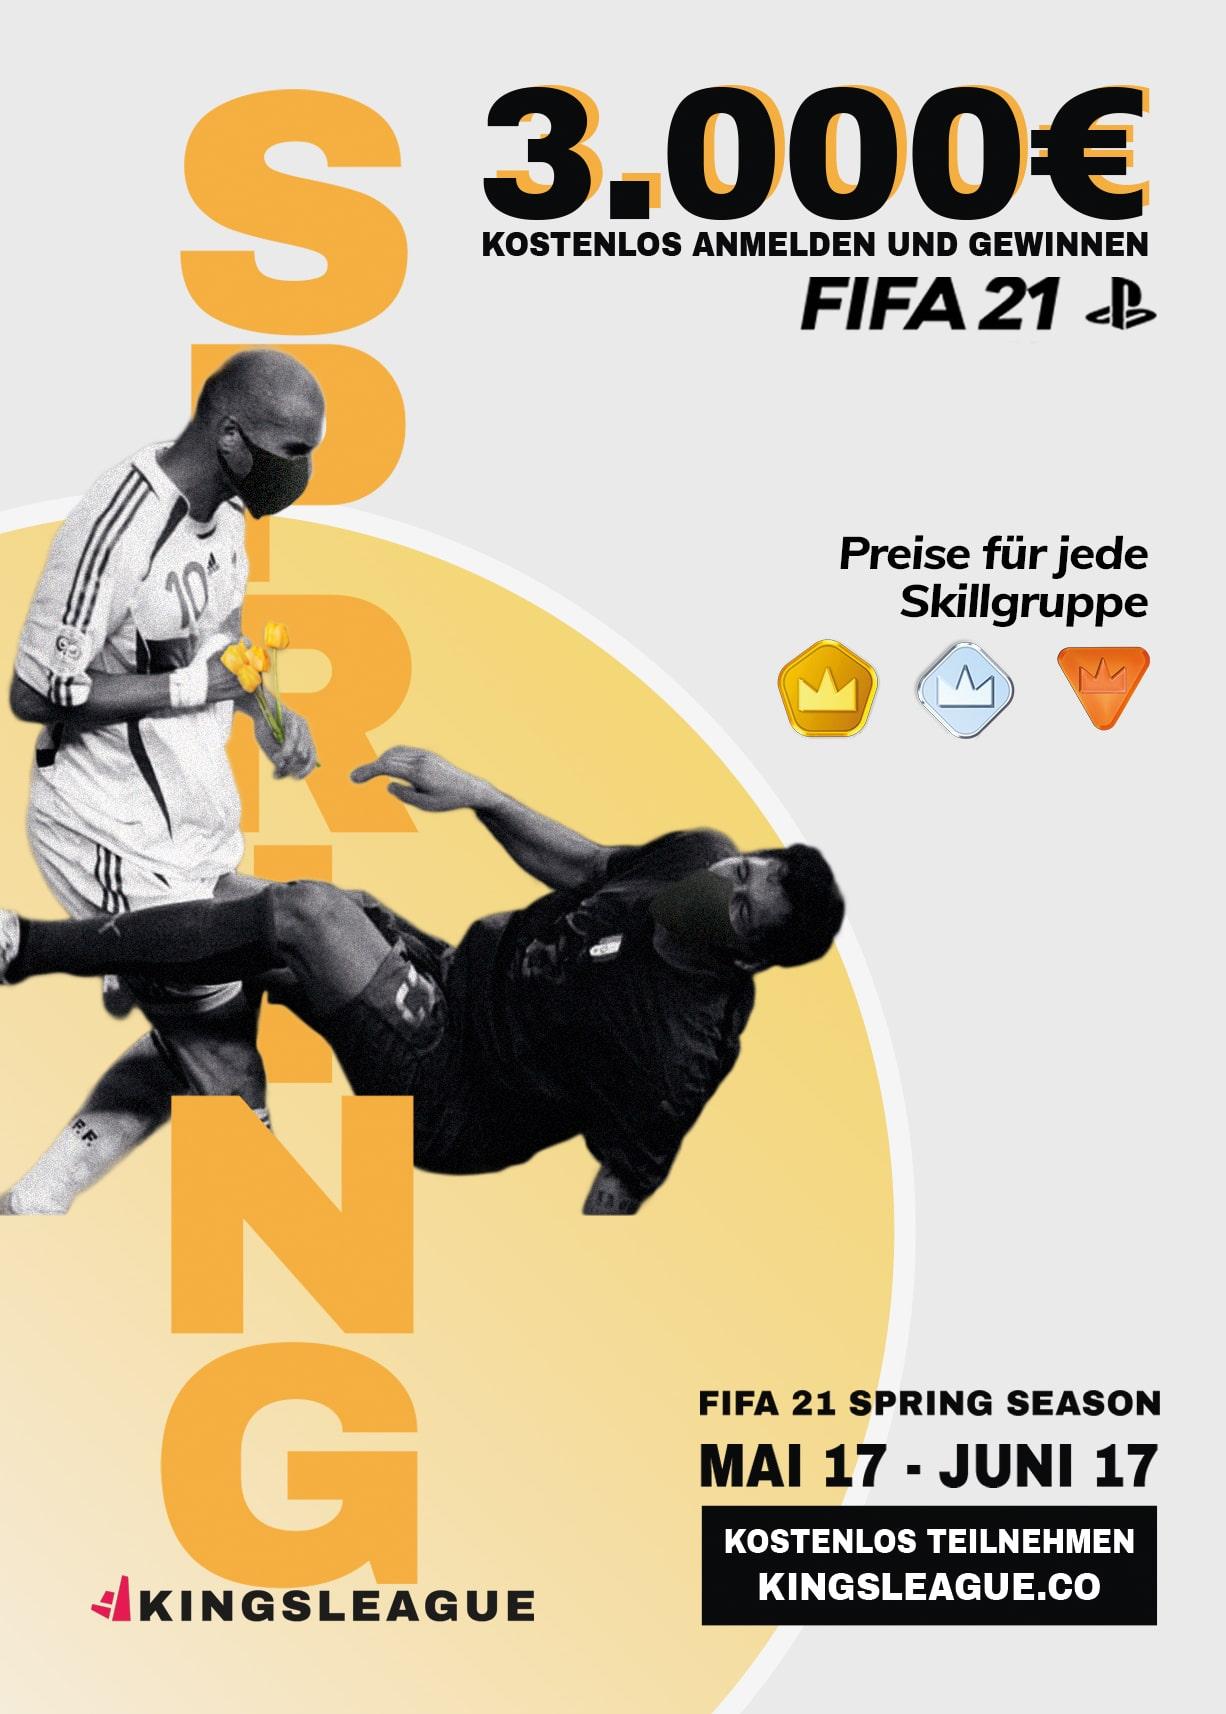 Kingsleague's FIFA 21 Spring Season